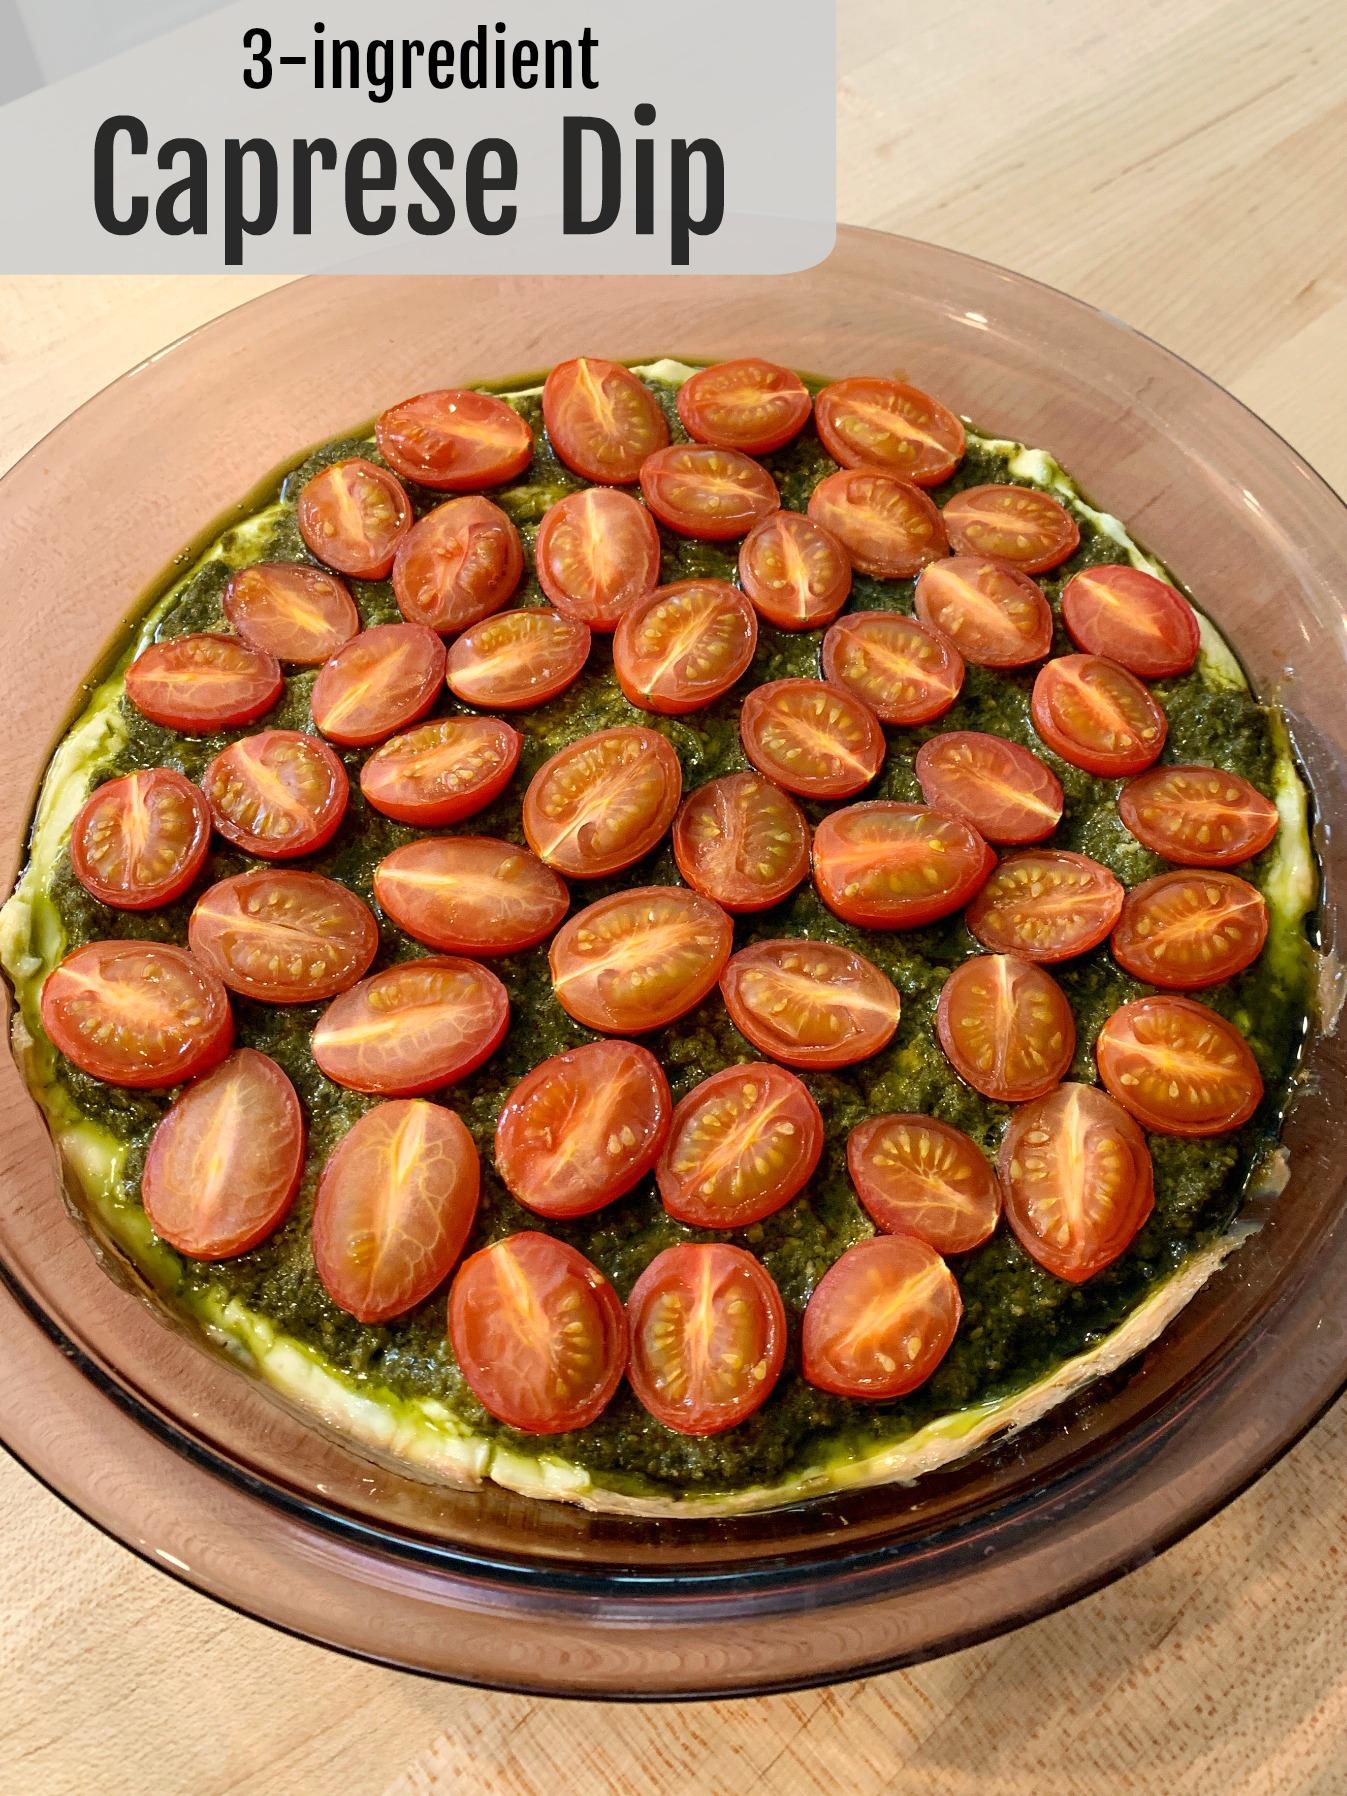 pie dish with baked caprese dip